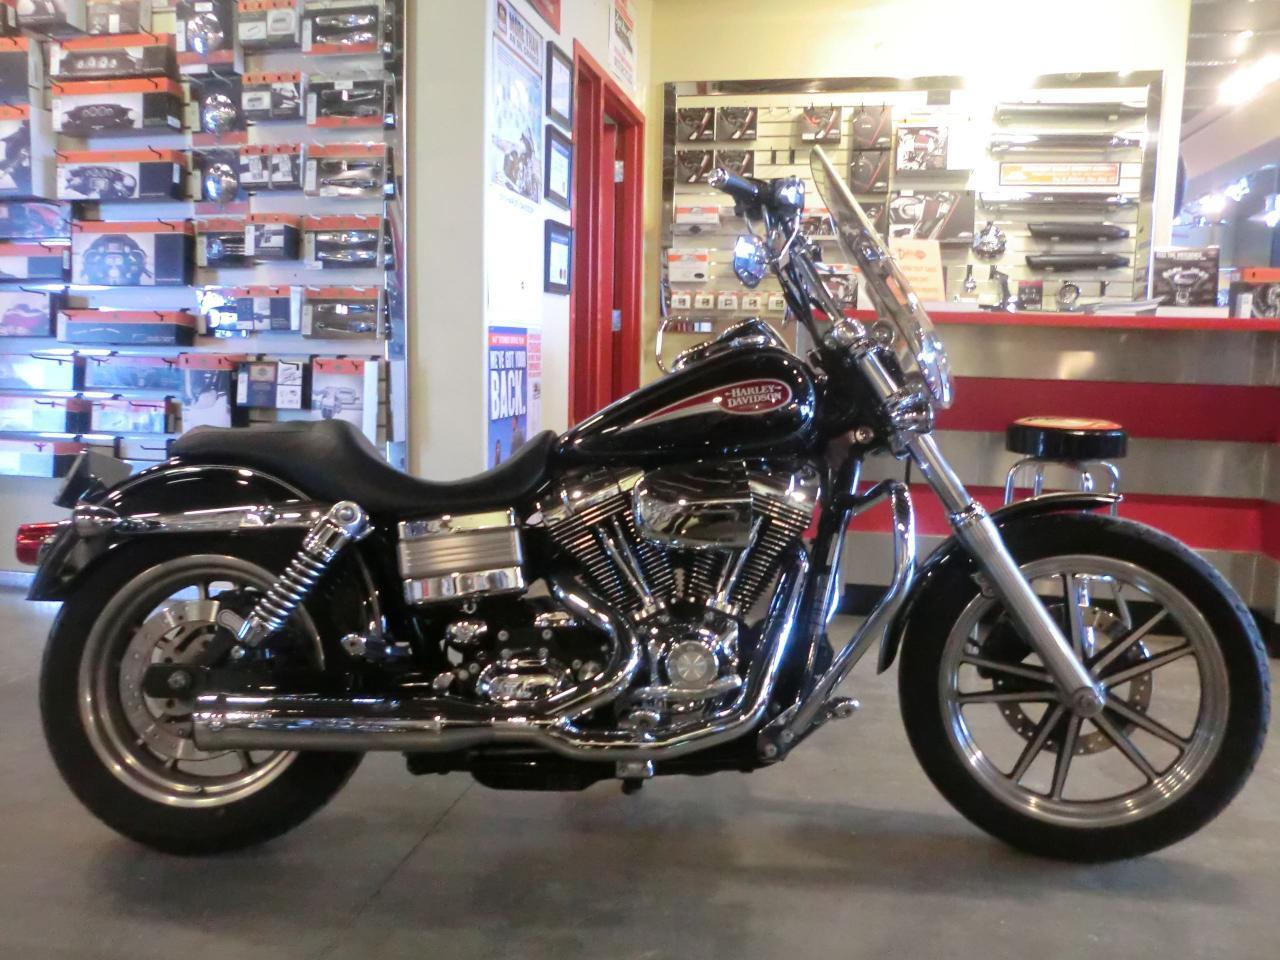 2007 Harley-Davidson Dyna FXDL Dyna Low Rider